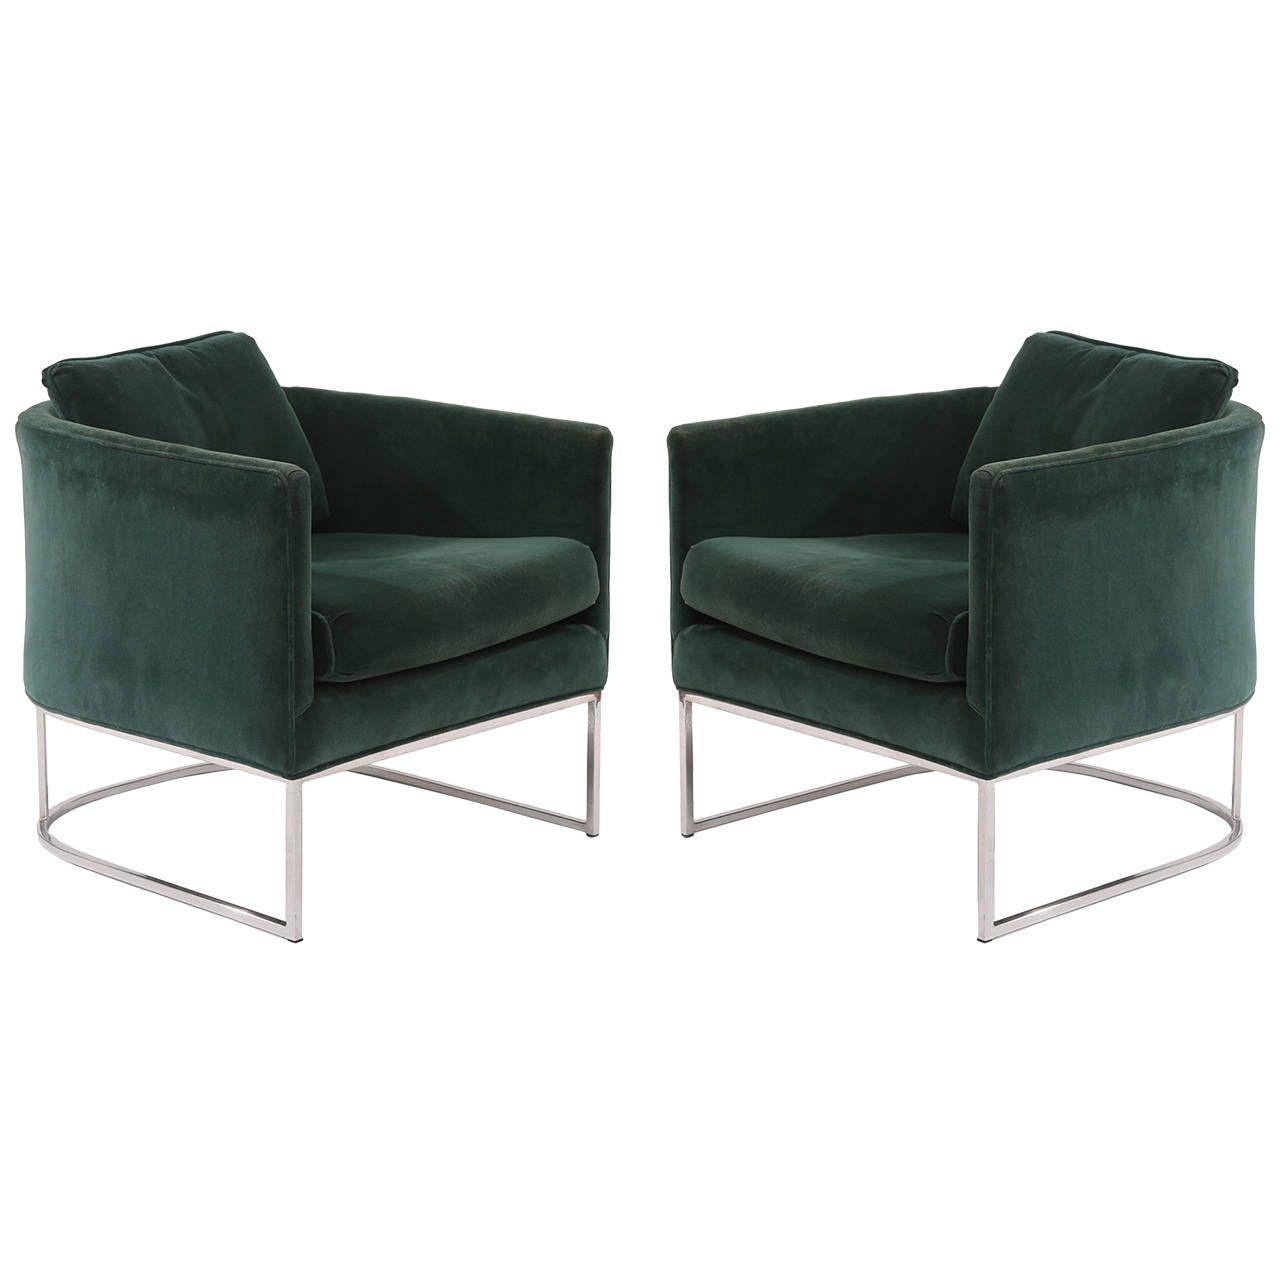 milo baughman furniture. Milo Baughman Thayer Coggin Velvet And Steel Lounge Chairs Furniture